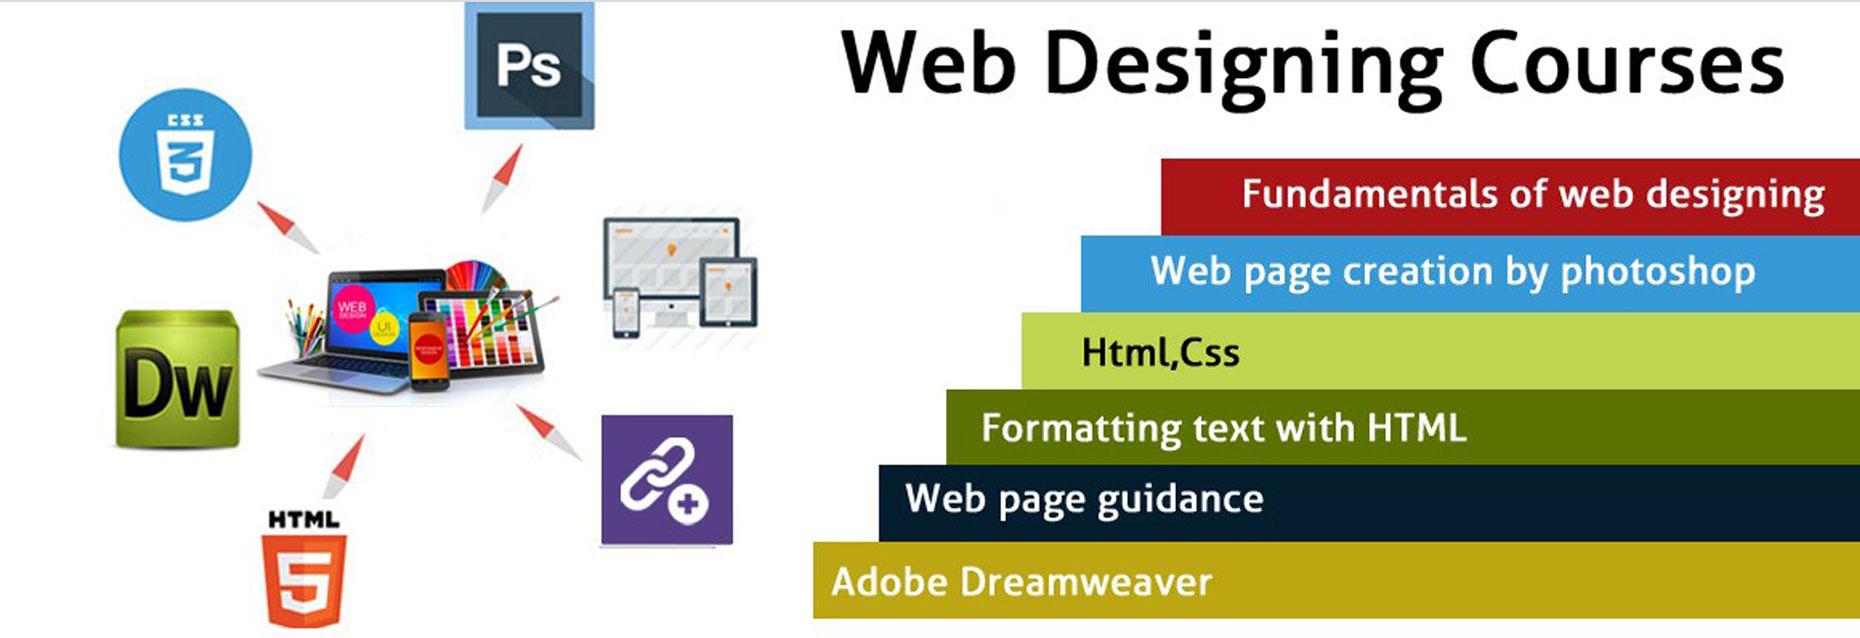 Web Designing Course Content